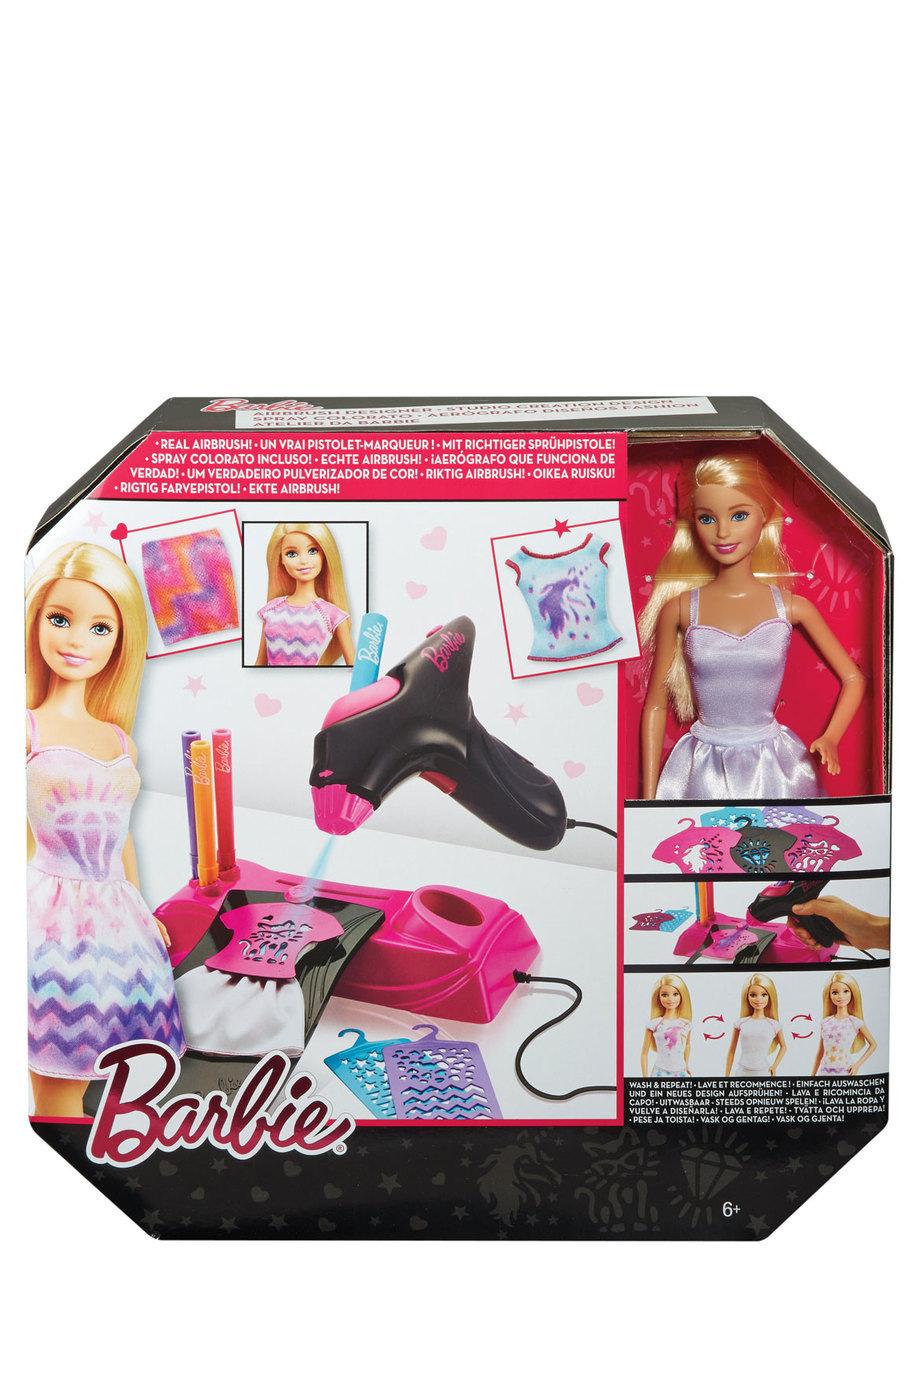 Barbie airbrush designer doll myer online solutioingenieria Choice Image